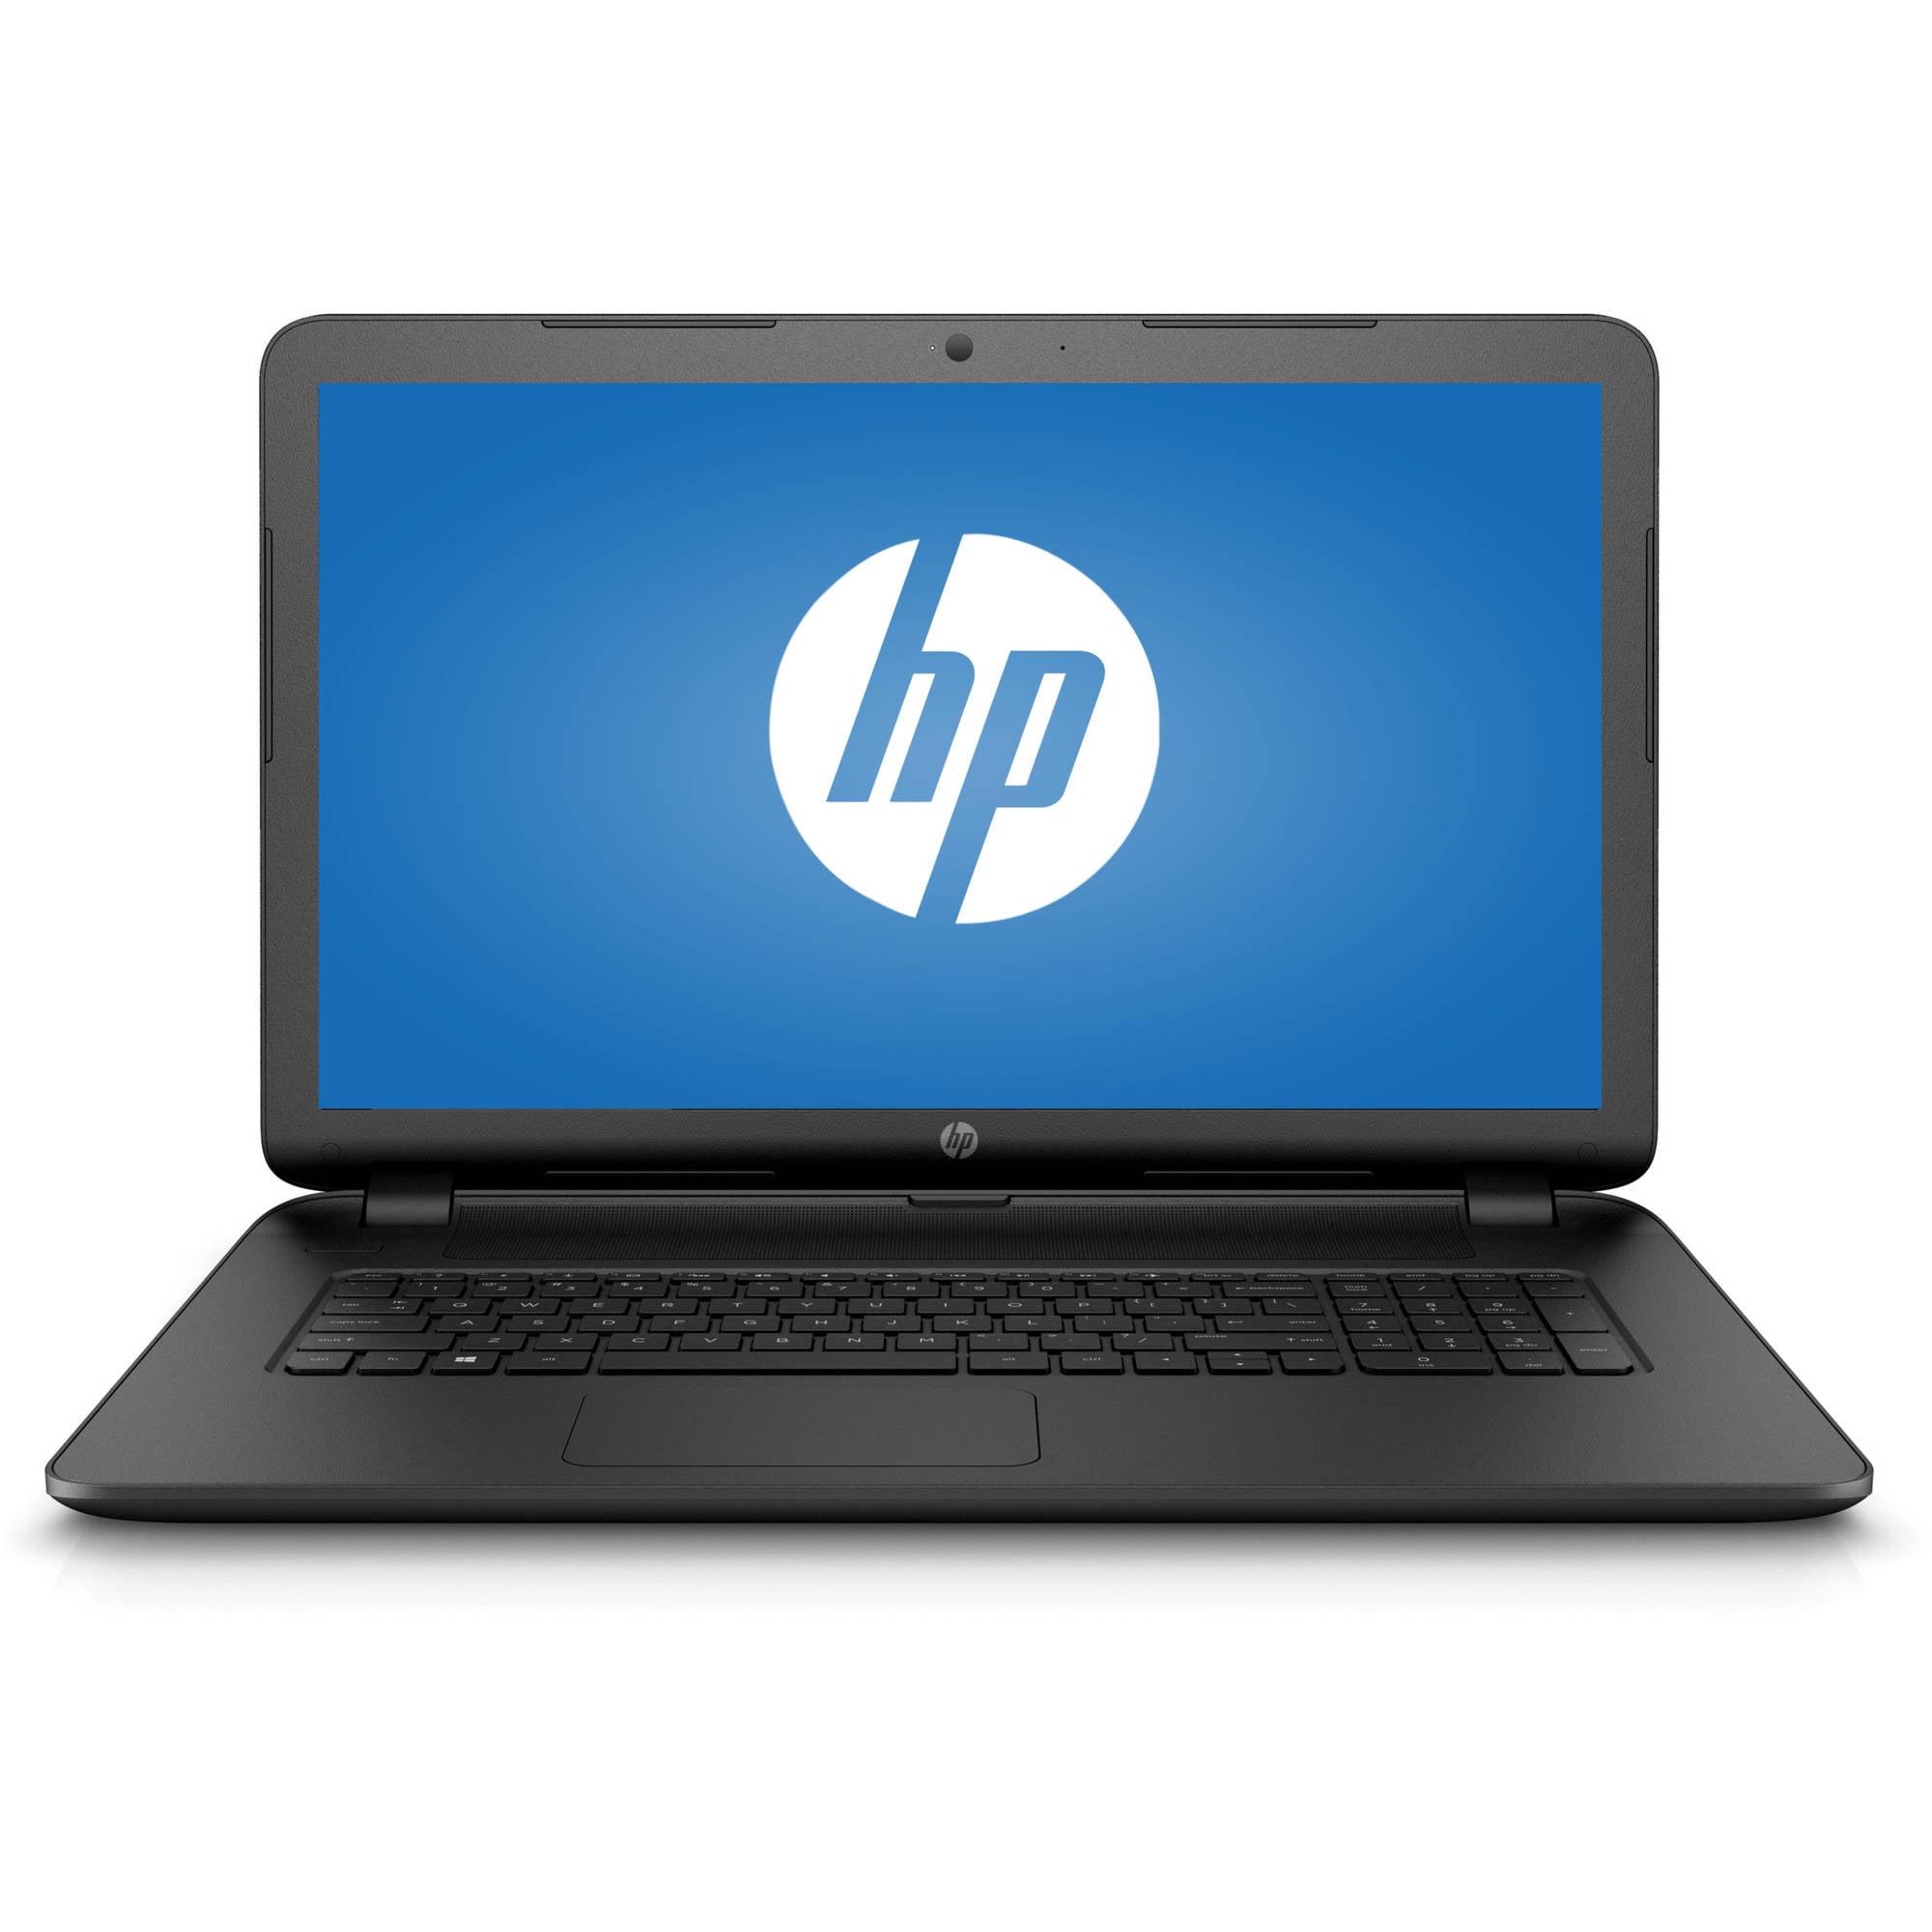 "HP Black 17.3"" 17-p120wm Laptop PC with AMD A8-7050 Dual-..."